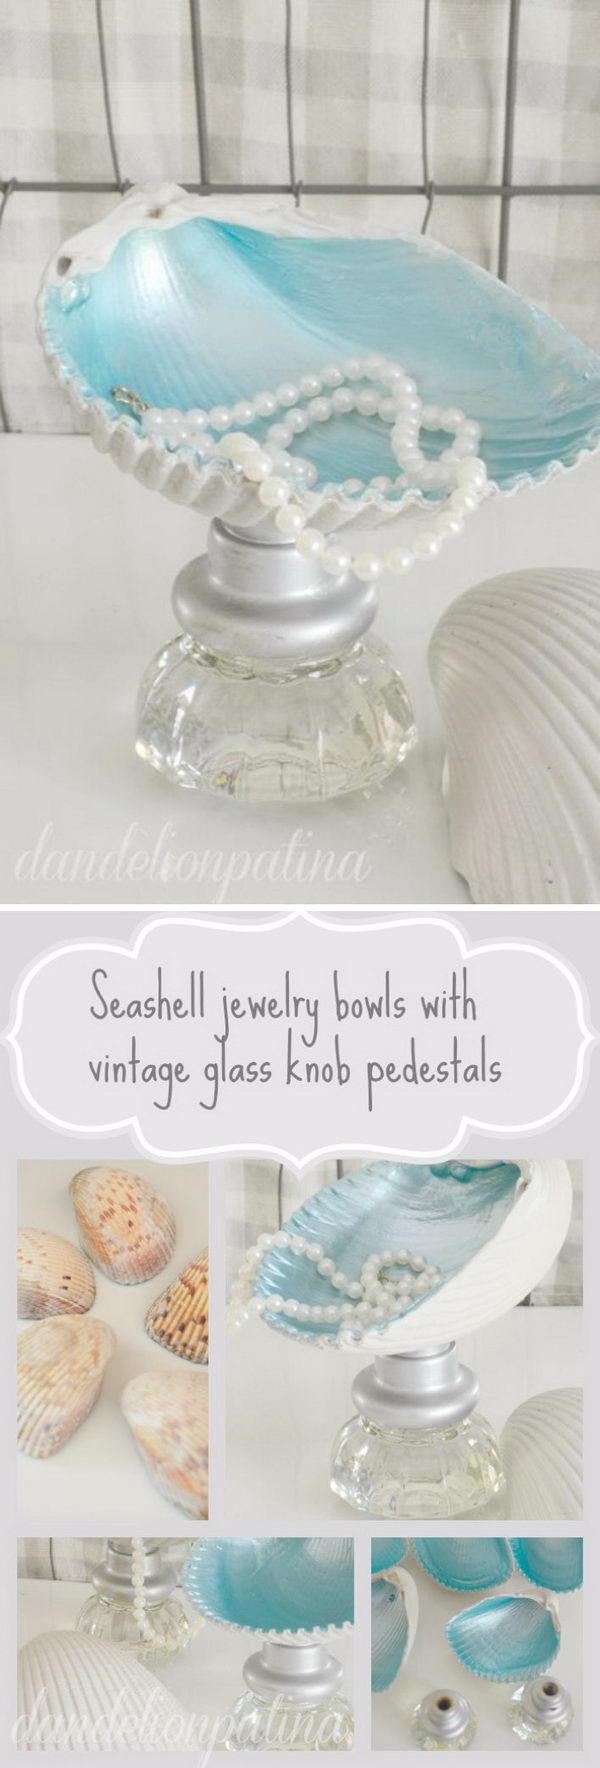 Shell Jewelry Bowls & Glass Knob Pedestals.